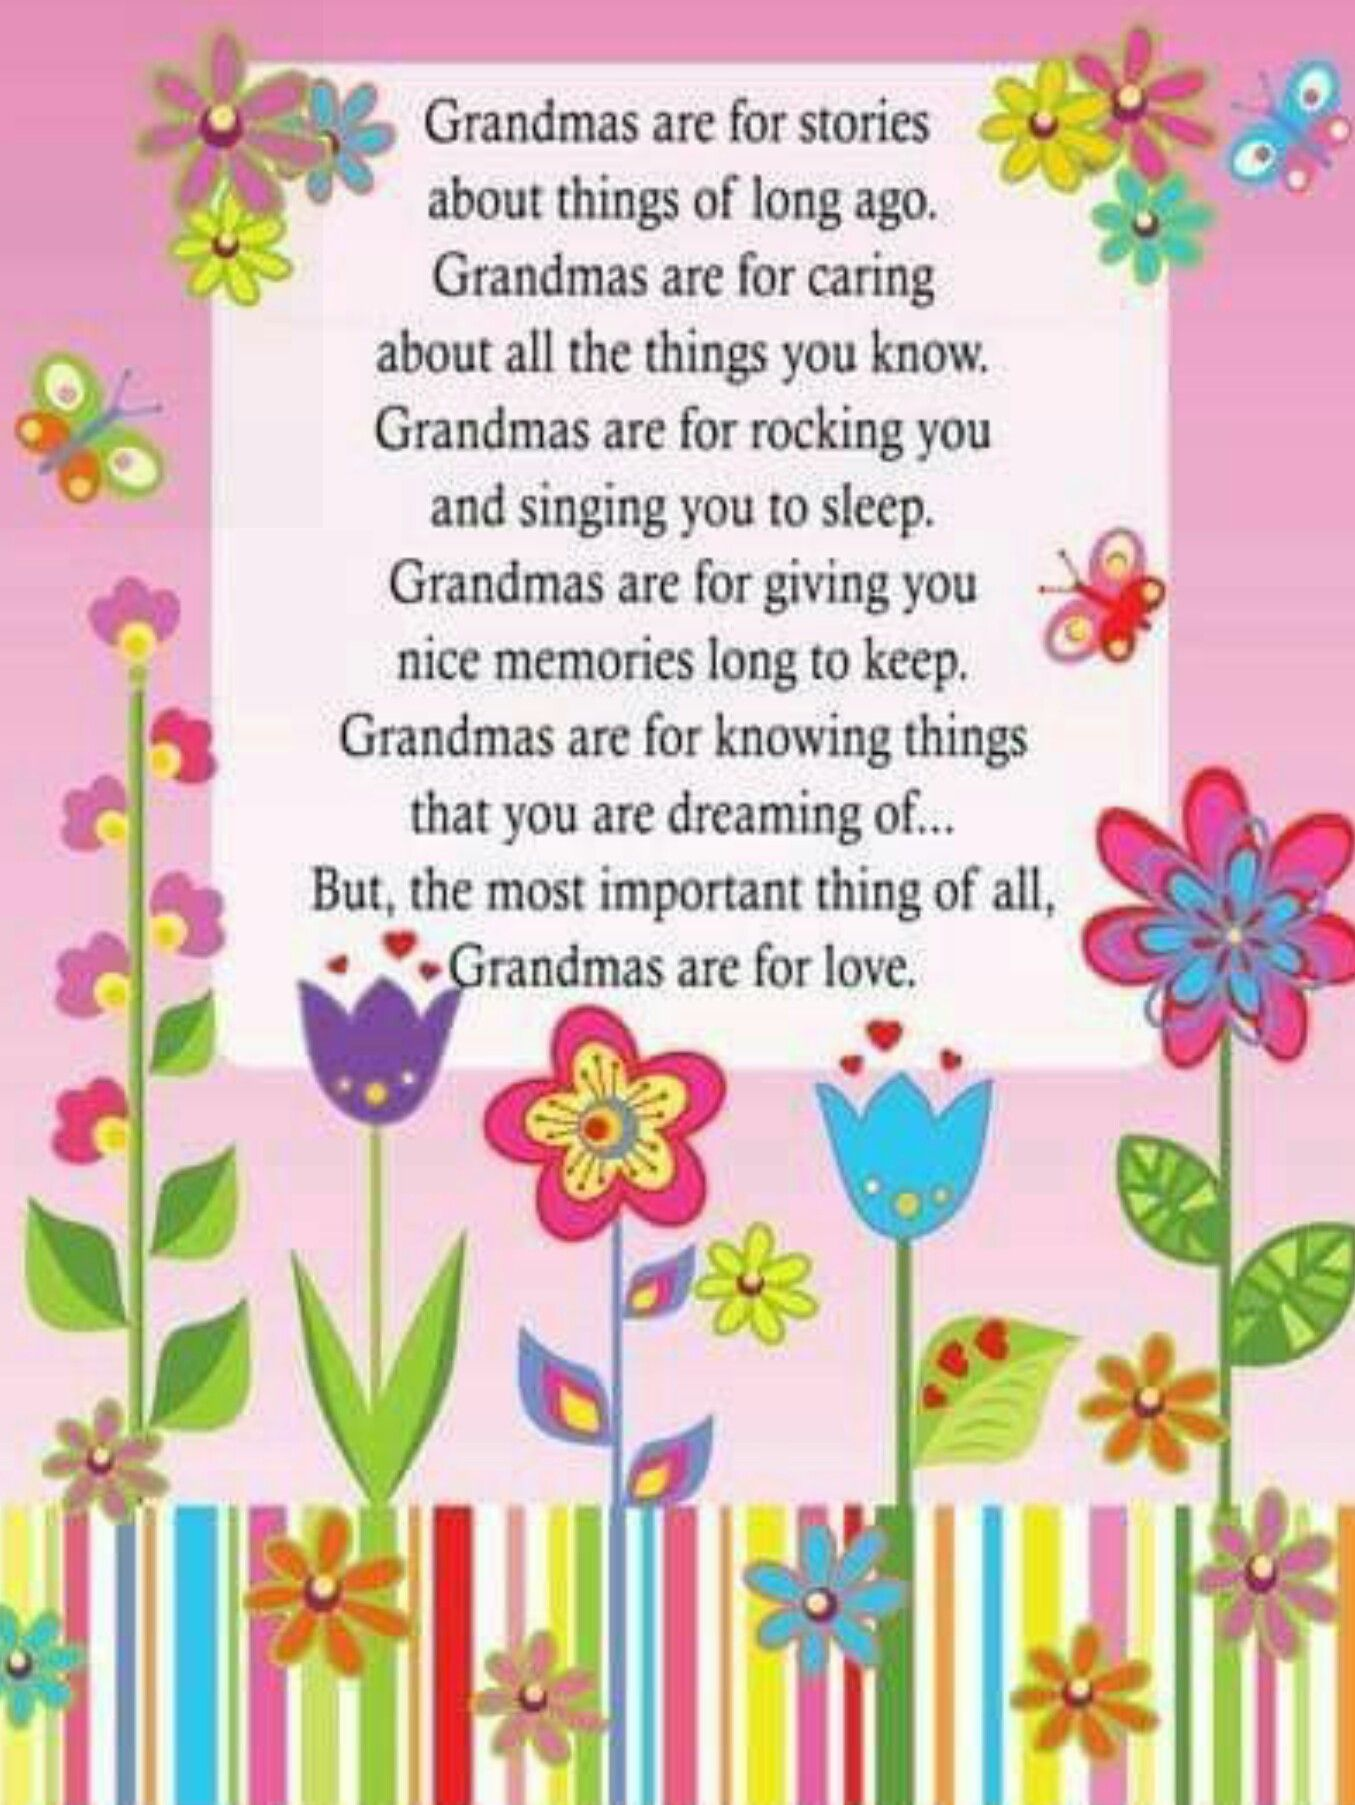 Grandmas are for stories happy birthday grandma grandma